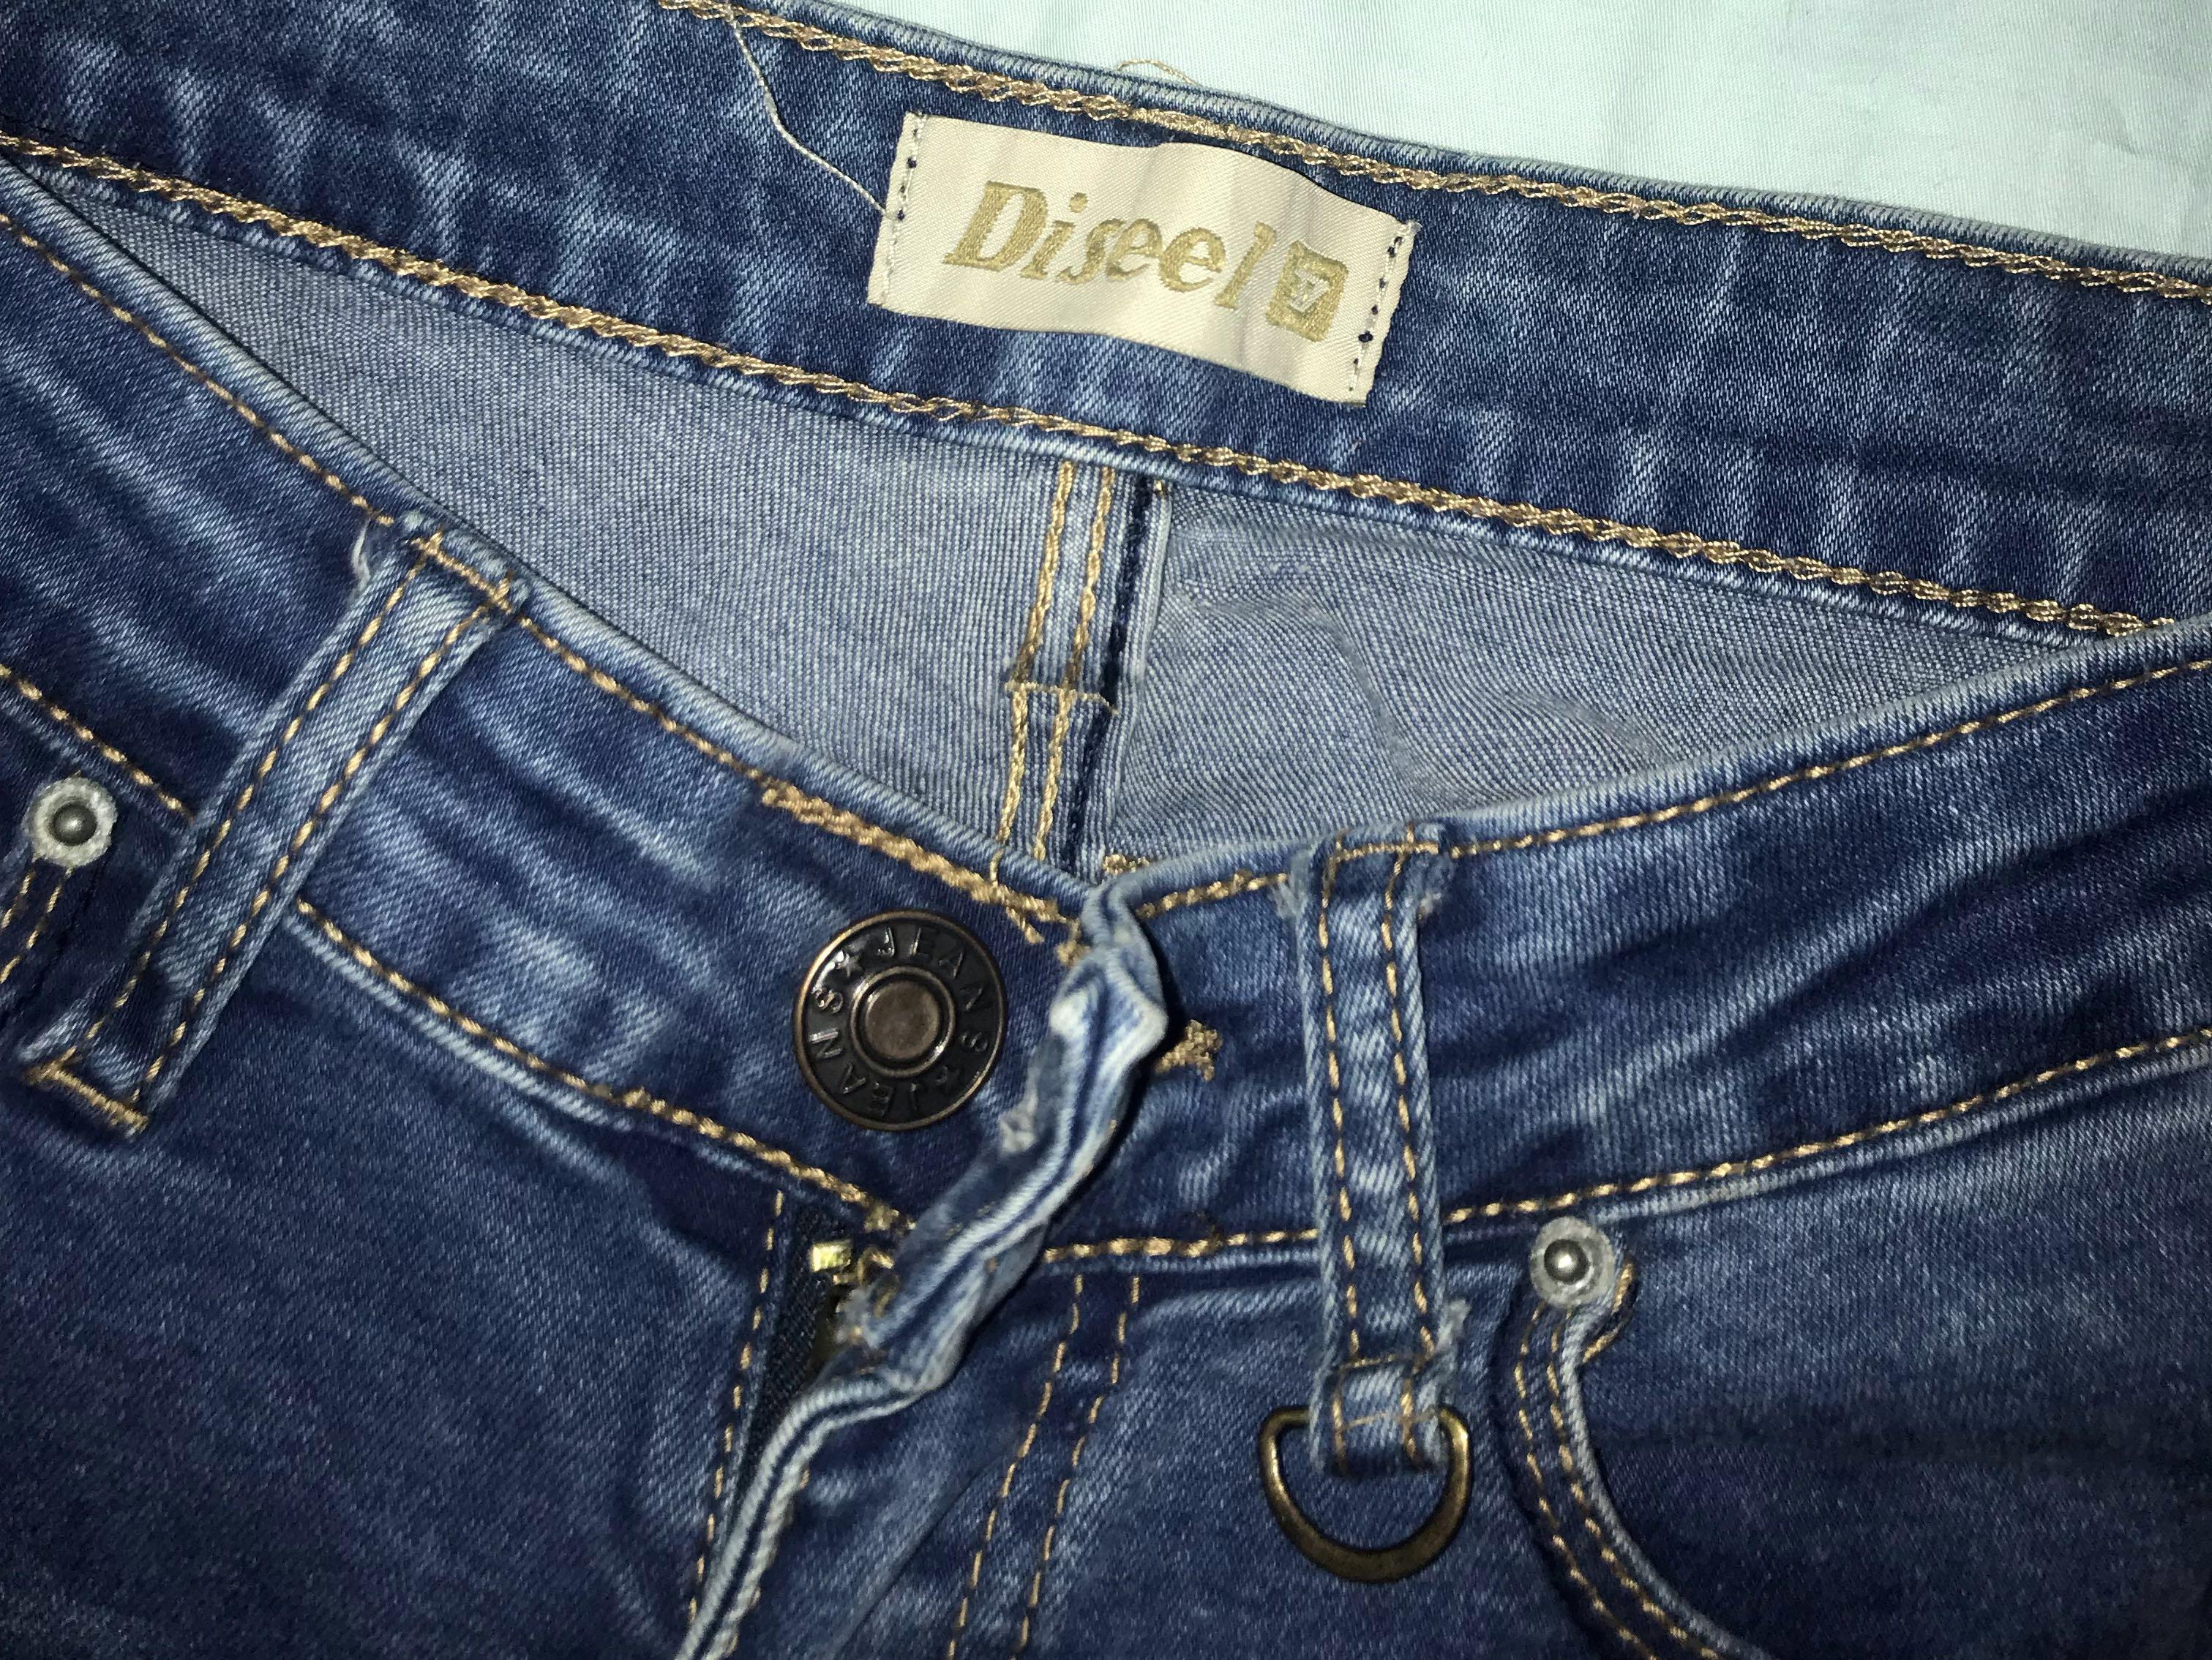 Blue Diseel jeans